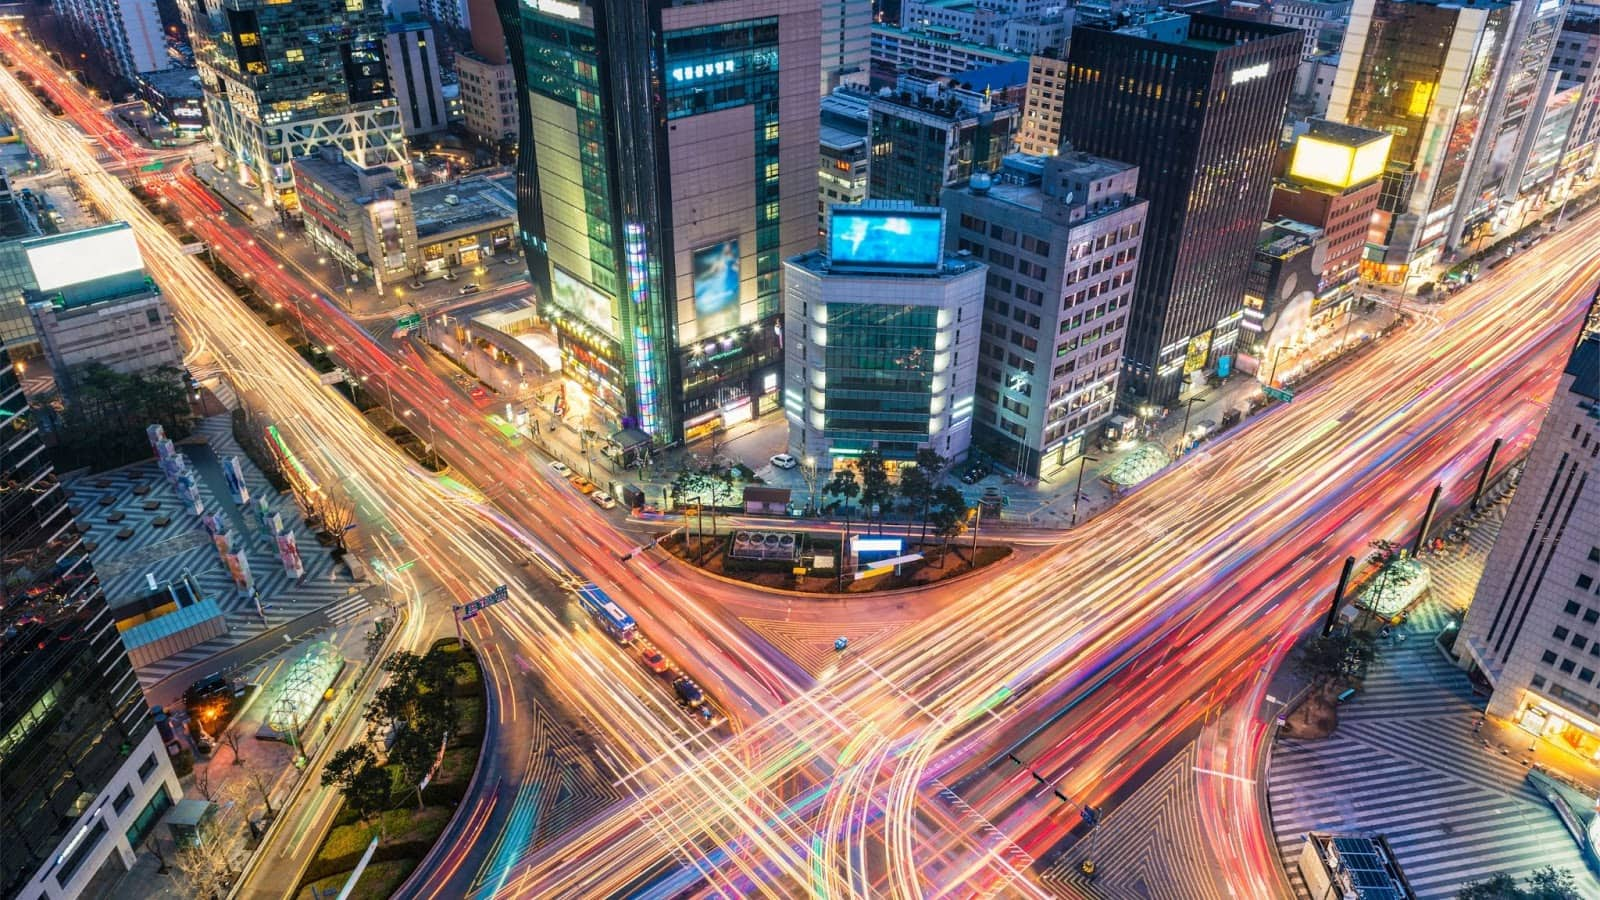 Transportation safety in South Korea